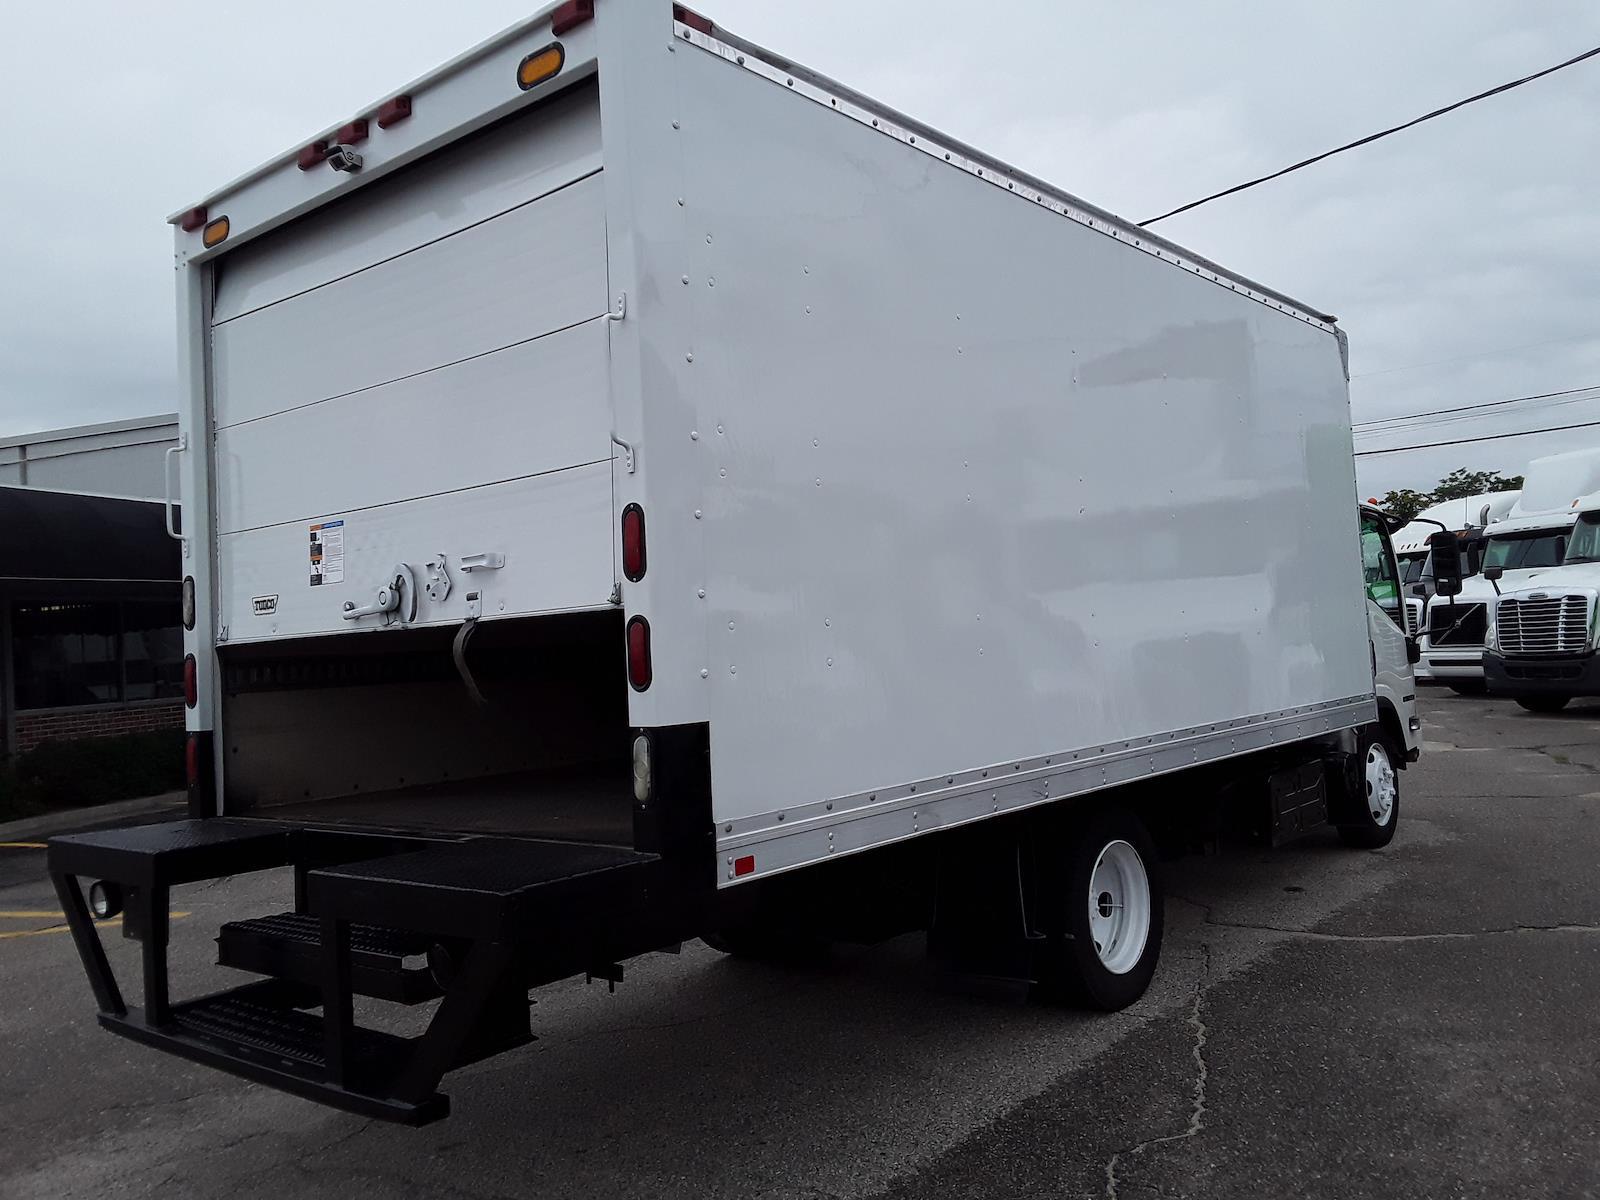 2015 Isuzu NQR Regular Cab 4x2, Dry Freight #650498 - photo 1